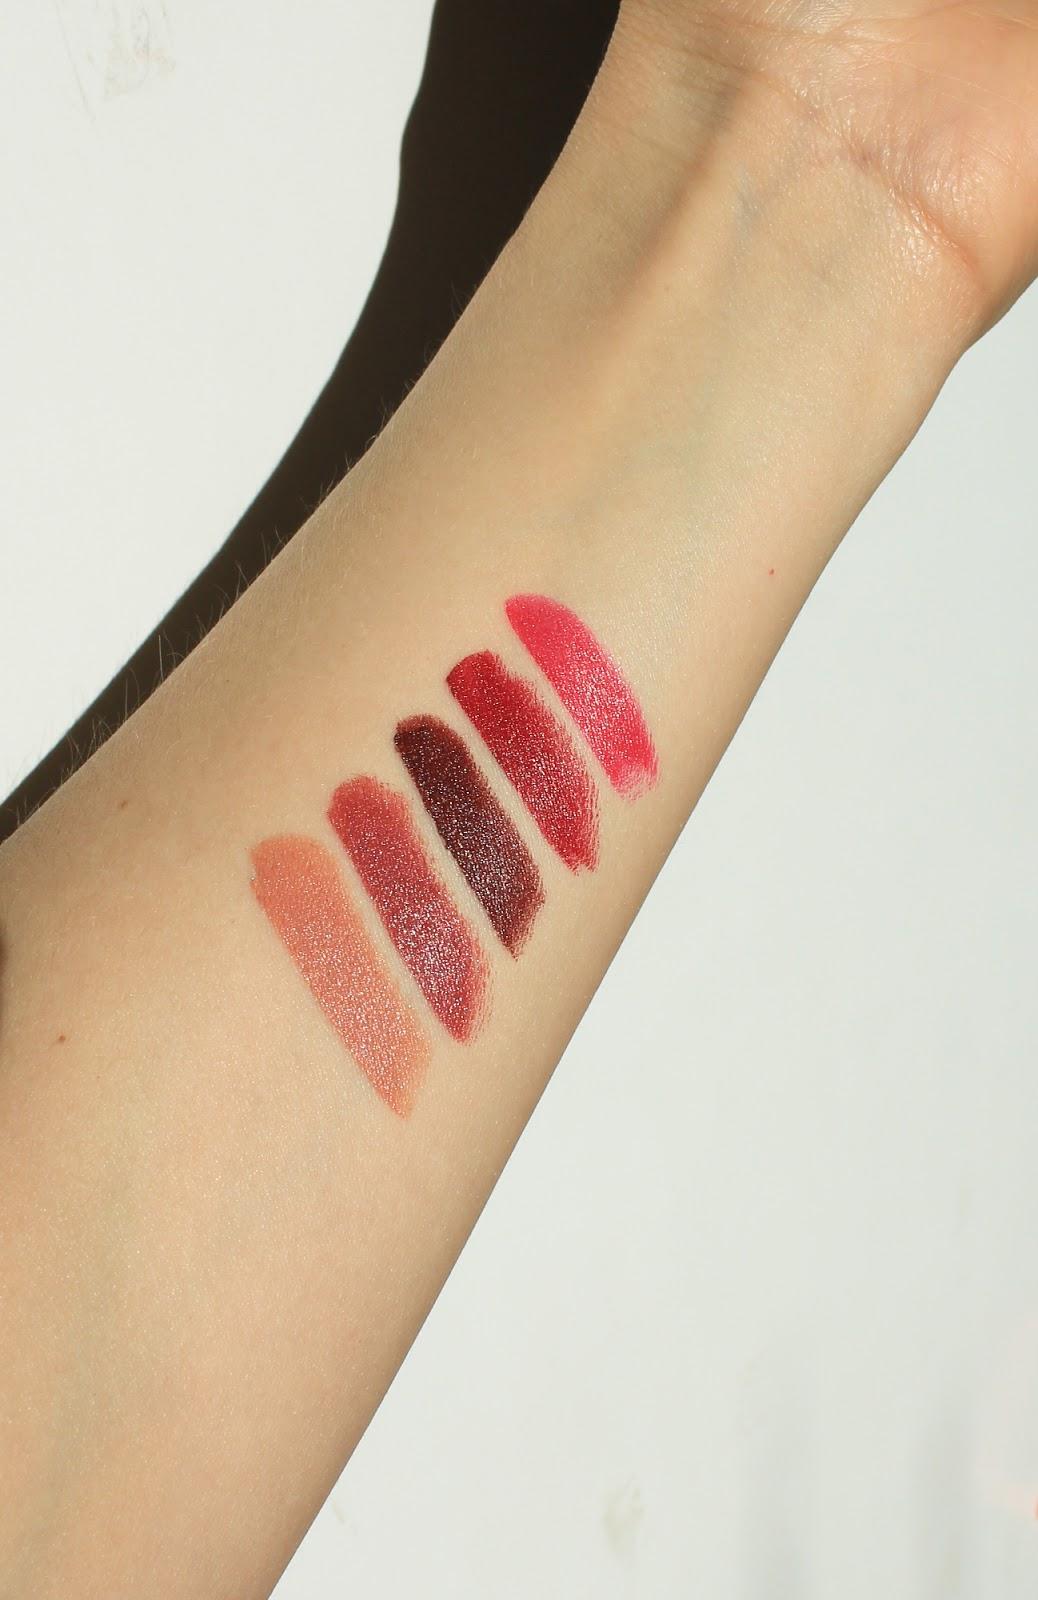 RMS Beauty Wild With Desire Mini Lipstick Set. LoveLula. Carmine free, natural. Jezebel, Unmistakable, Temptation, Masquerade, Nightfall